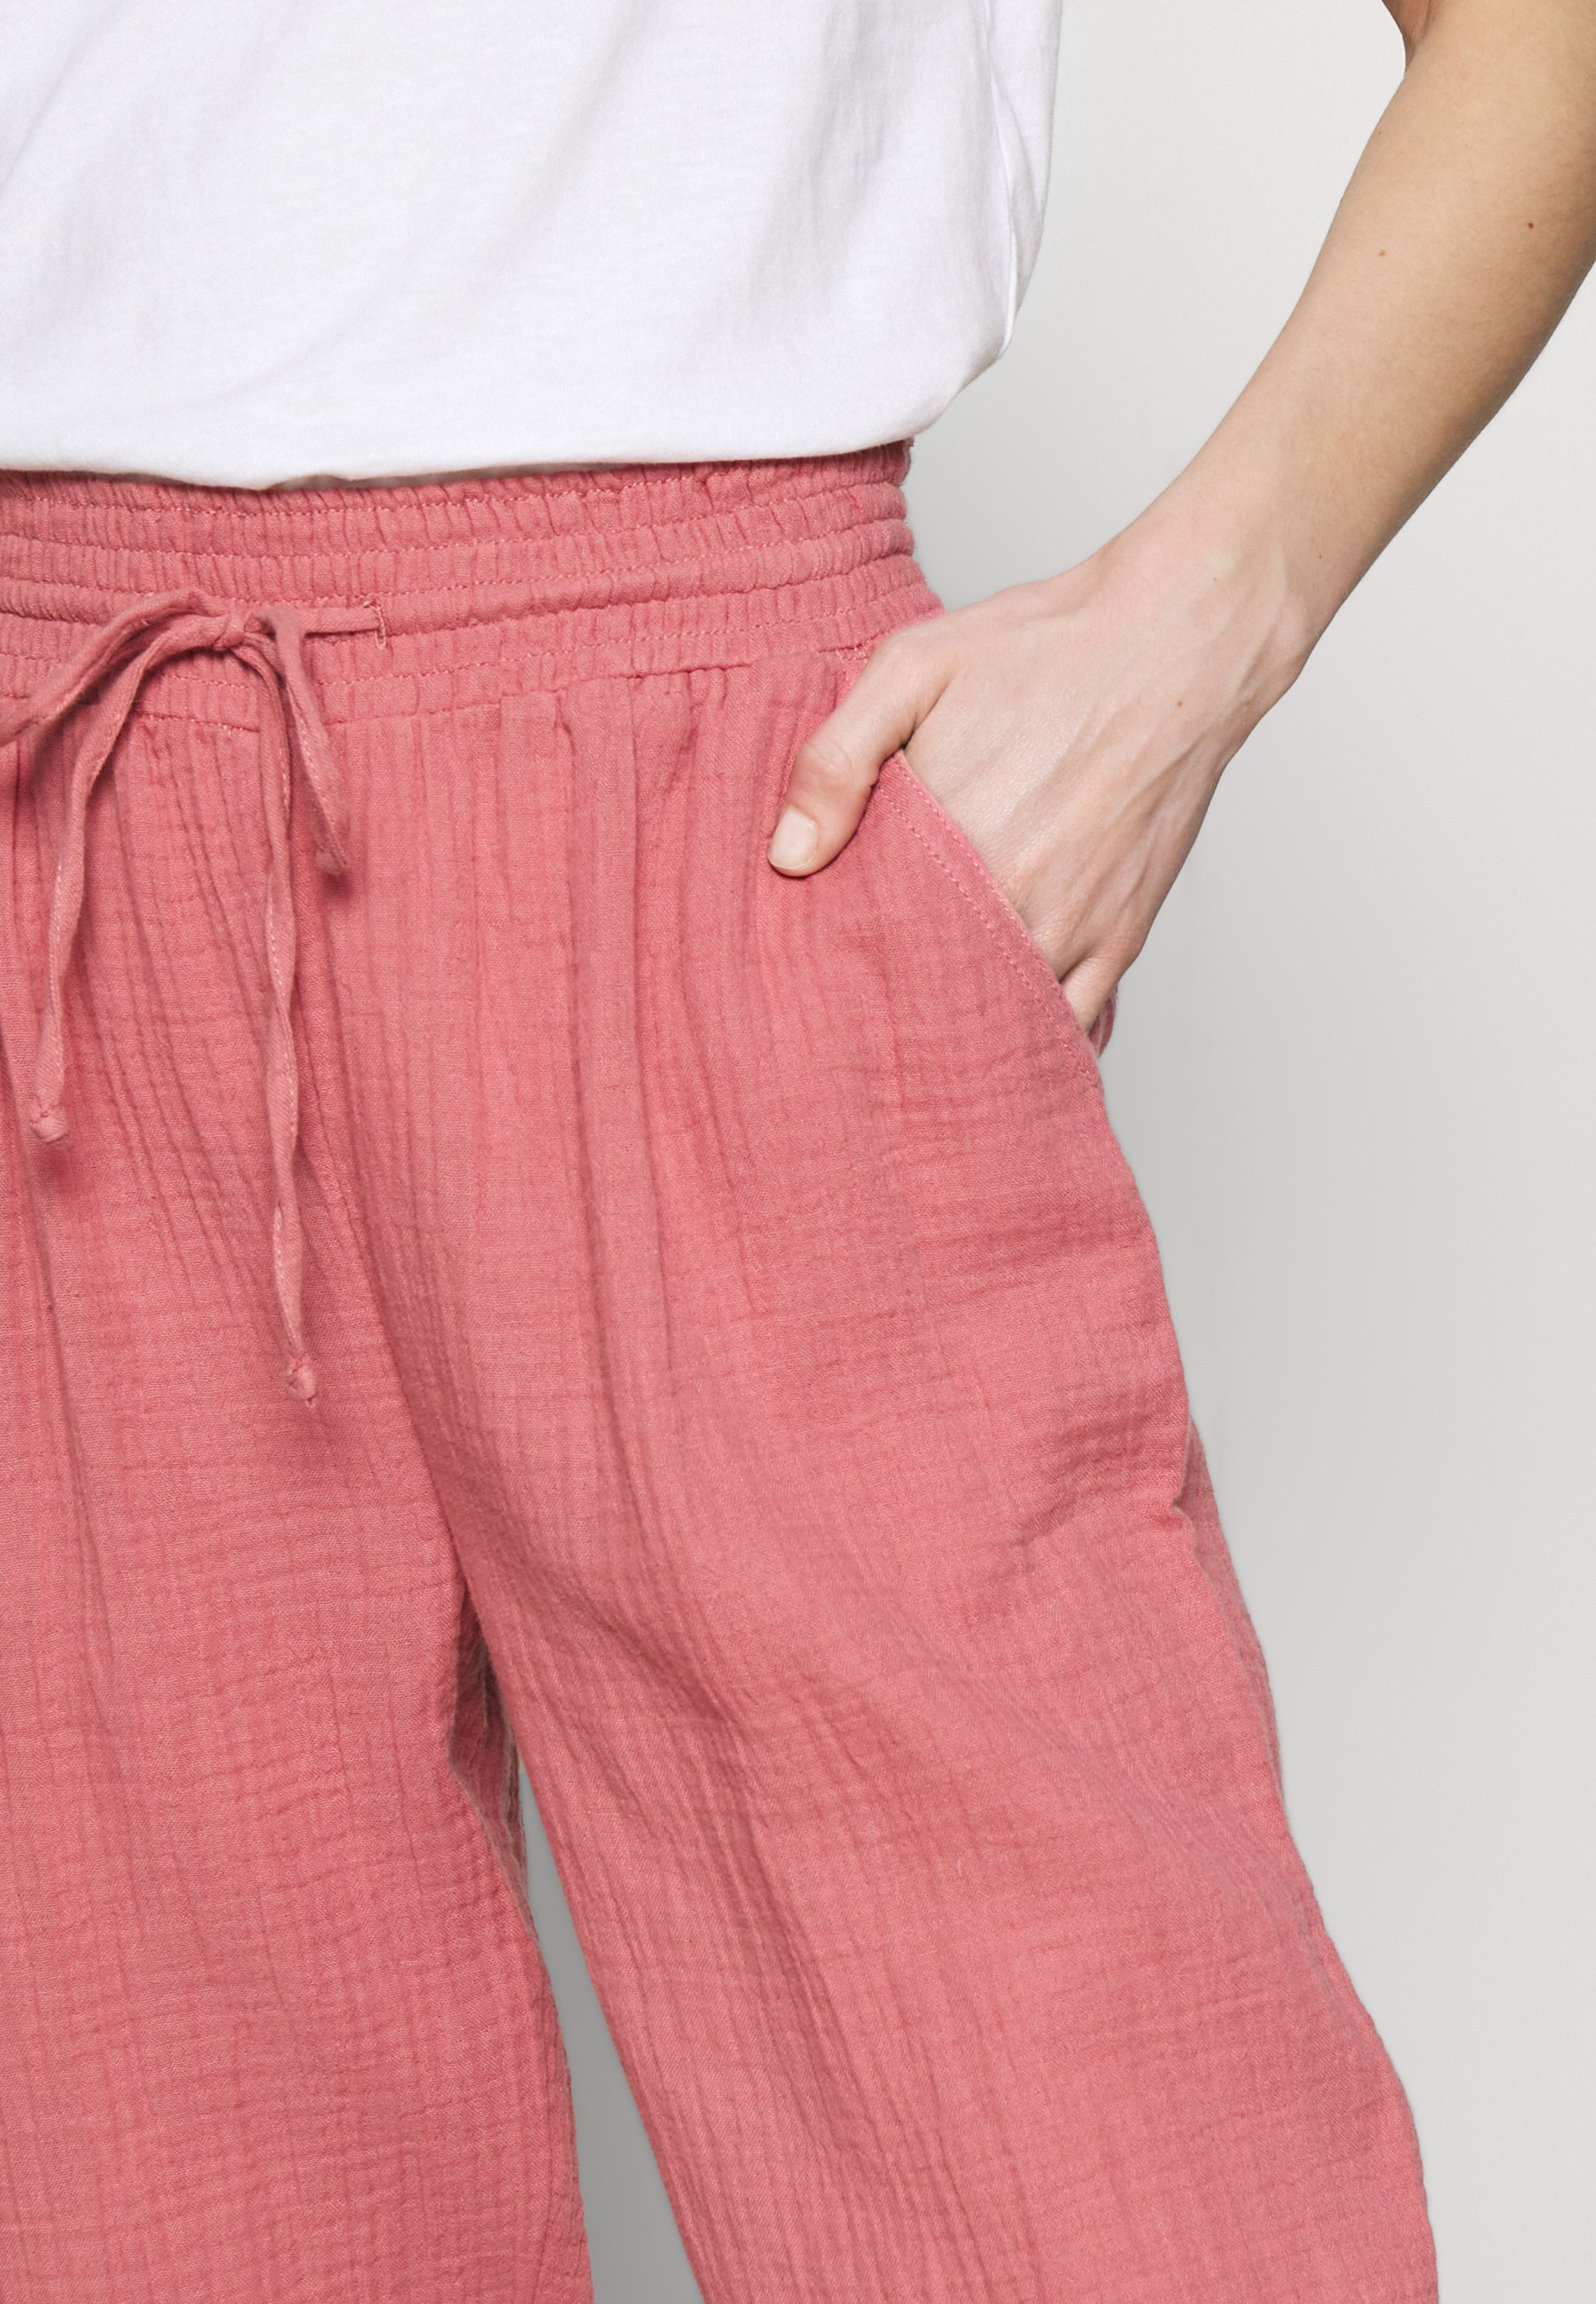 Donna MUSLIN PANT - Pantaloni del pigiama